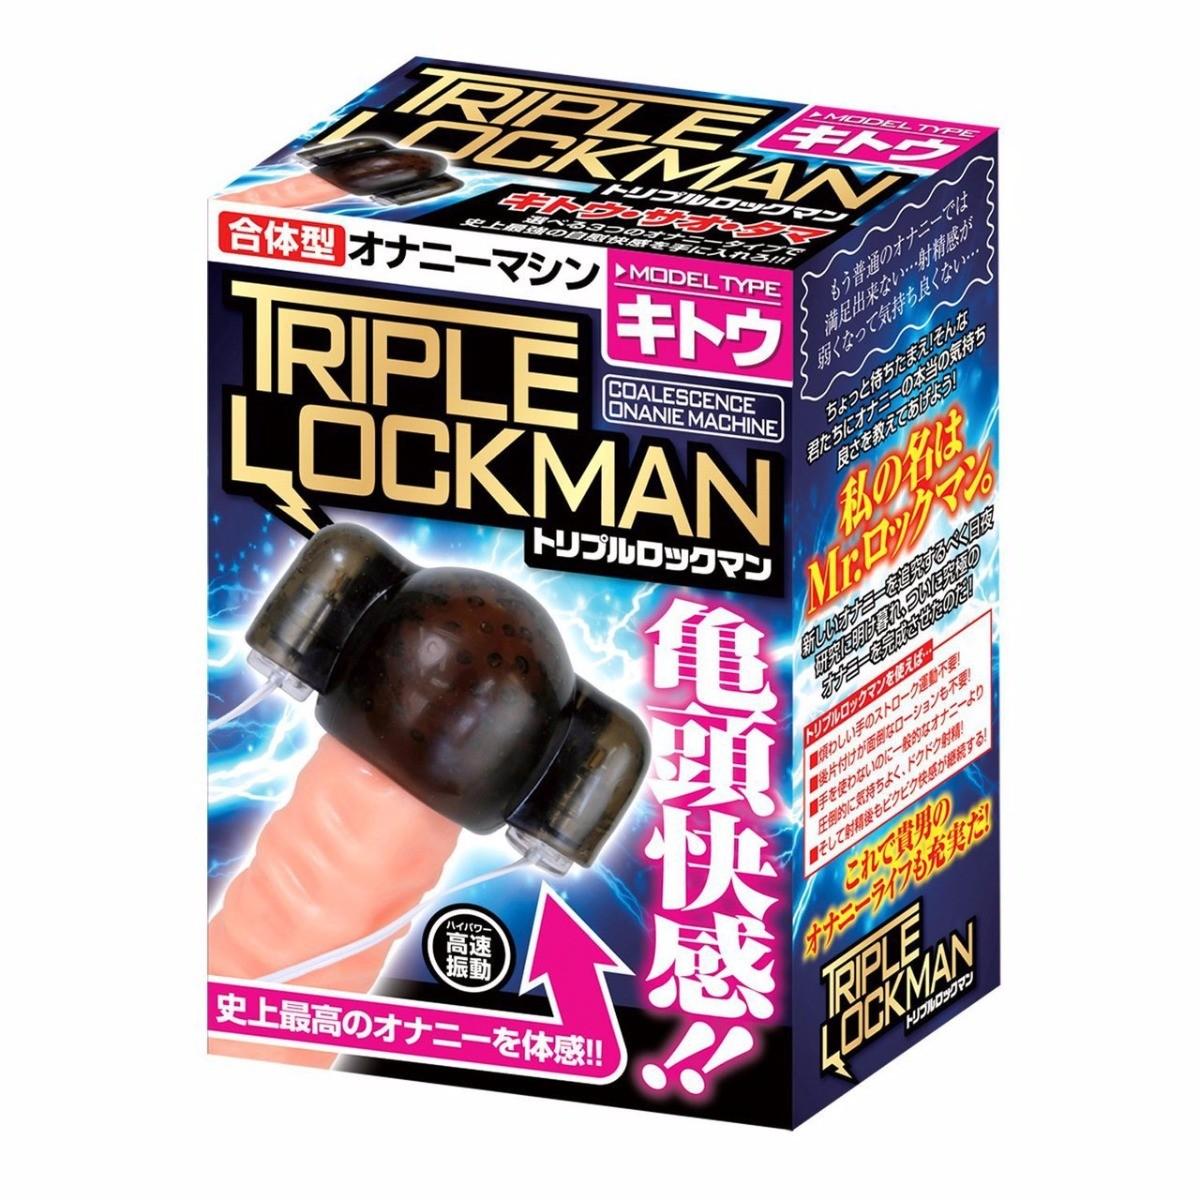 Triple Lockman (Kitou)